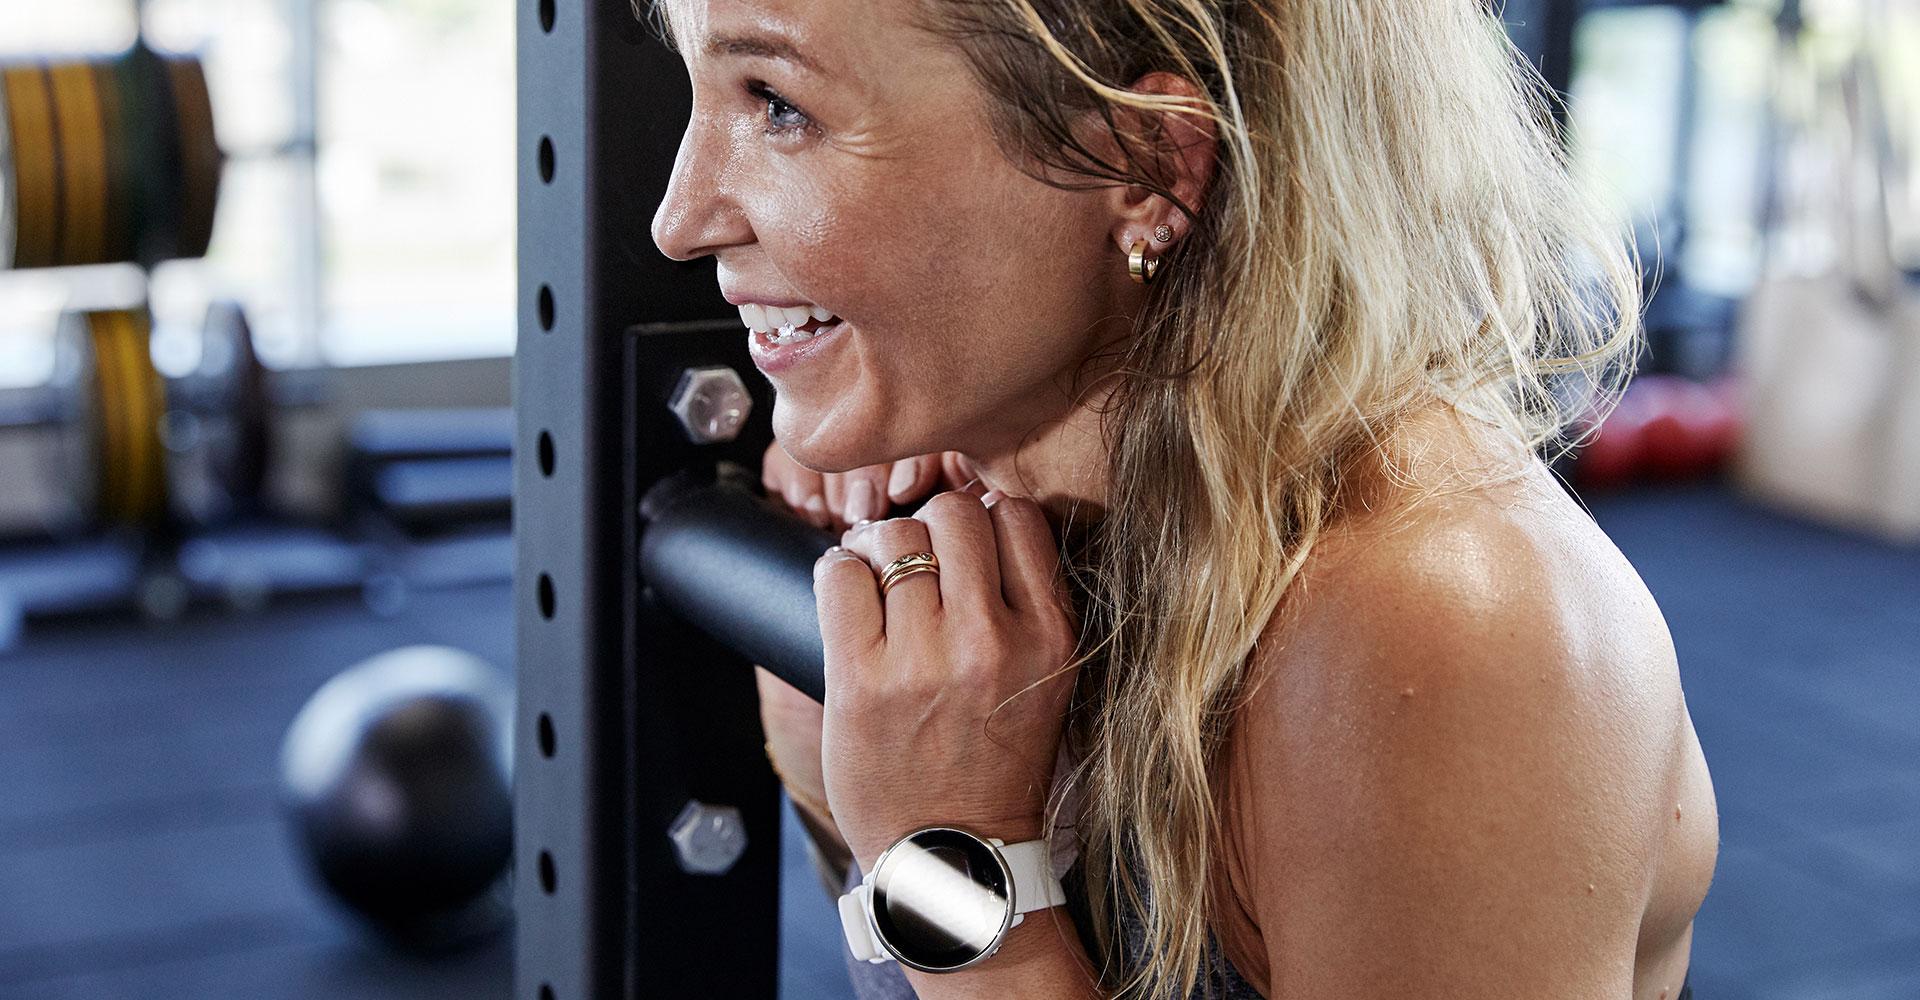 Heart Rate Monitors Activity Trackers And Bike Computers